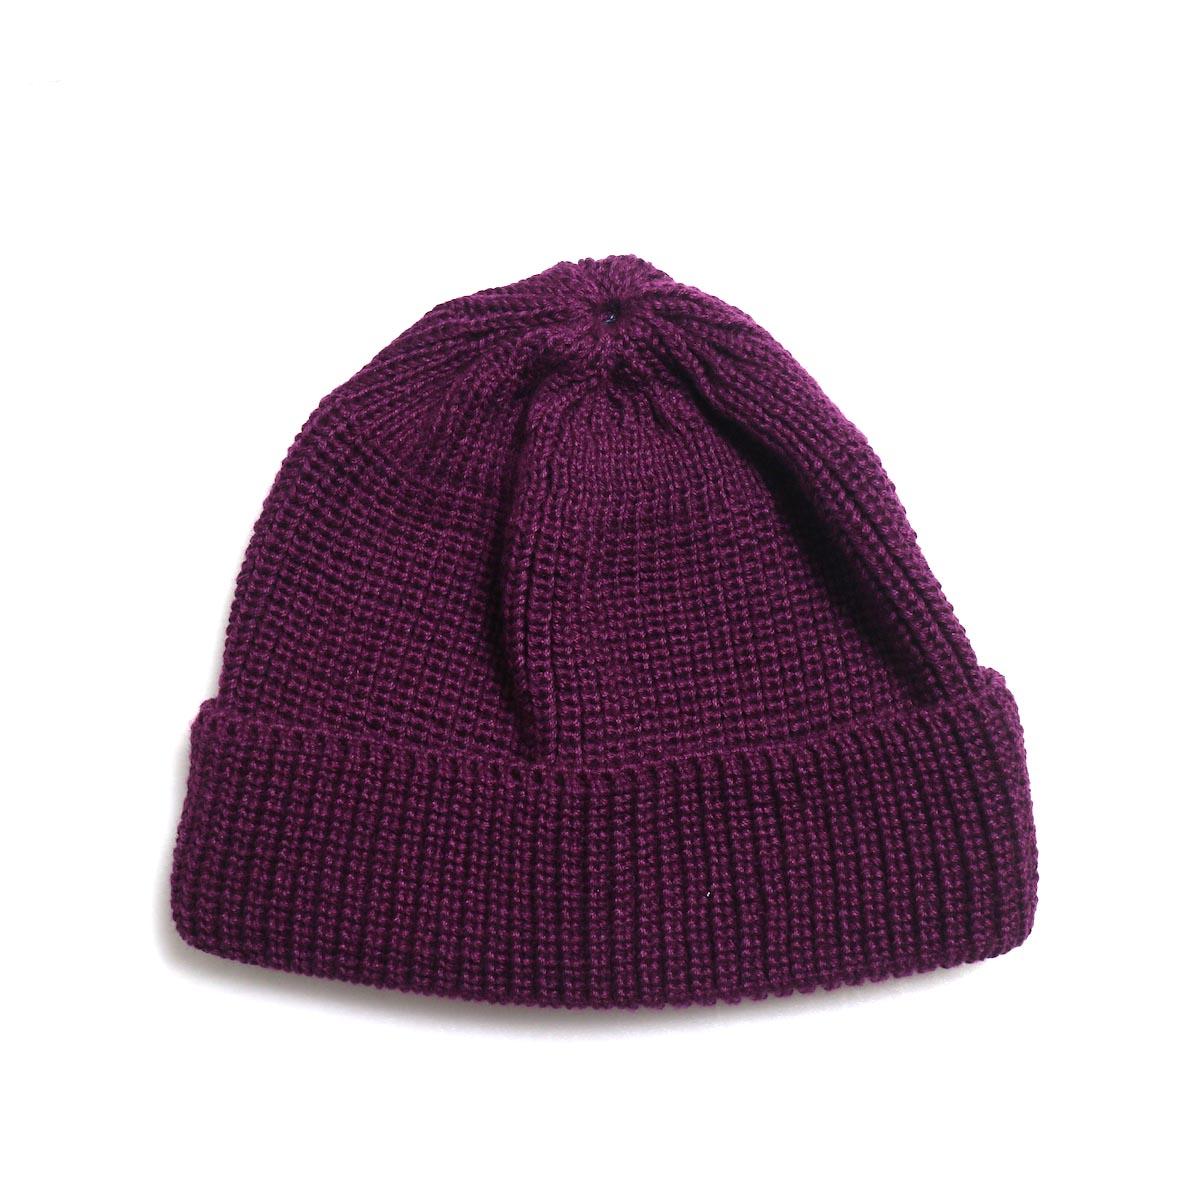 LEUCHTFEUER / WALFANGER -Cotton×Acrylic (Purple)